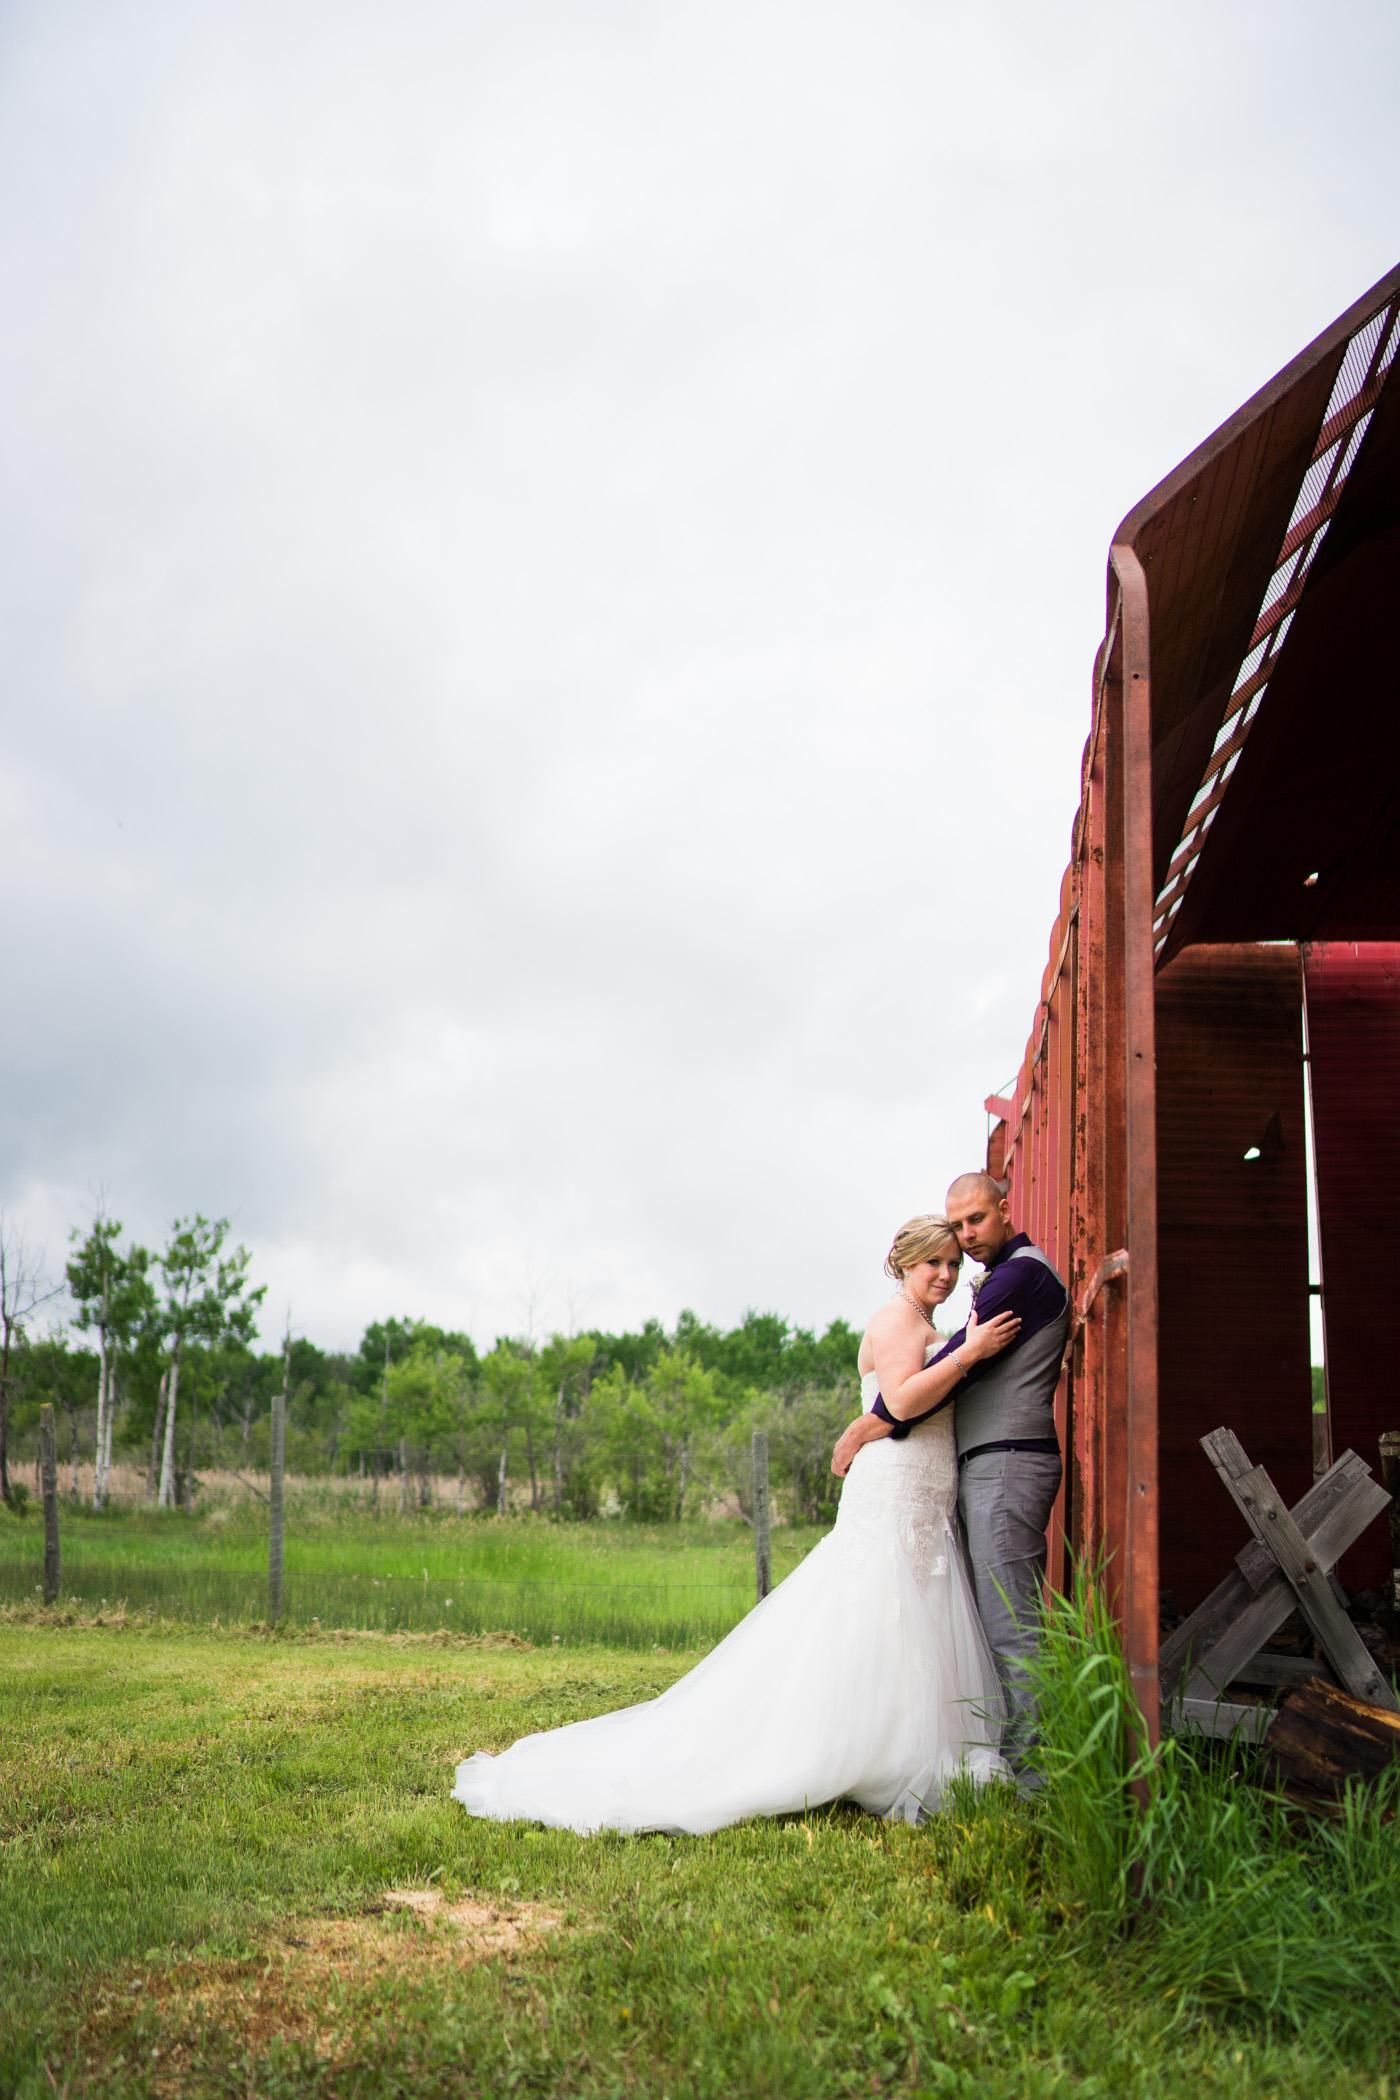 COJO Photo - Whitney and Steve - Wedding-453.jpg